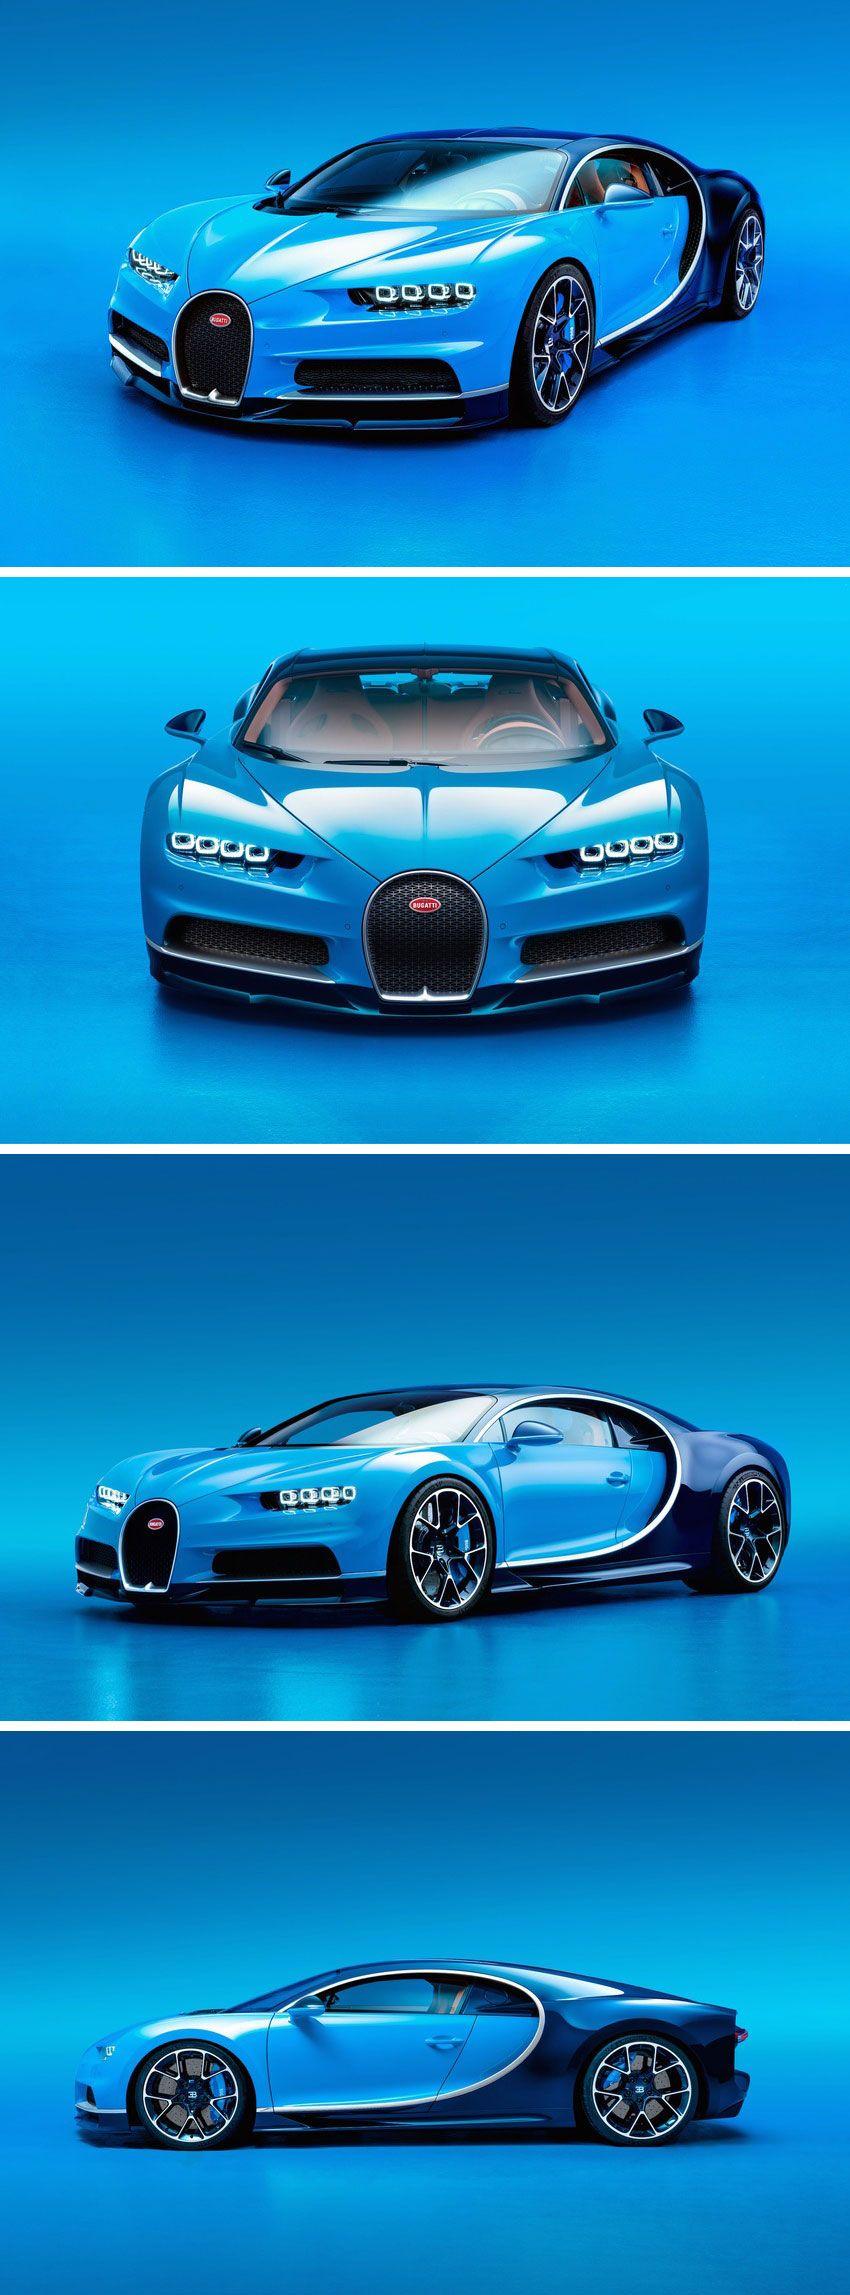 102cb6998035c889fe897798566c0adb Cozy Bugatti Veyron W16 Engine Price Cars Trend